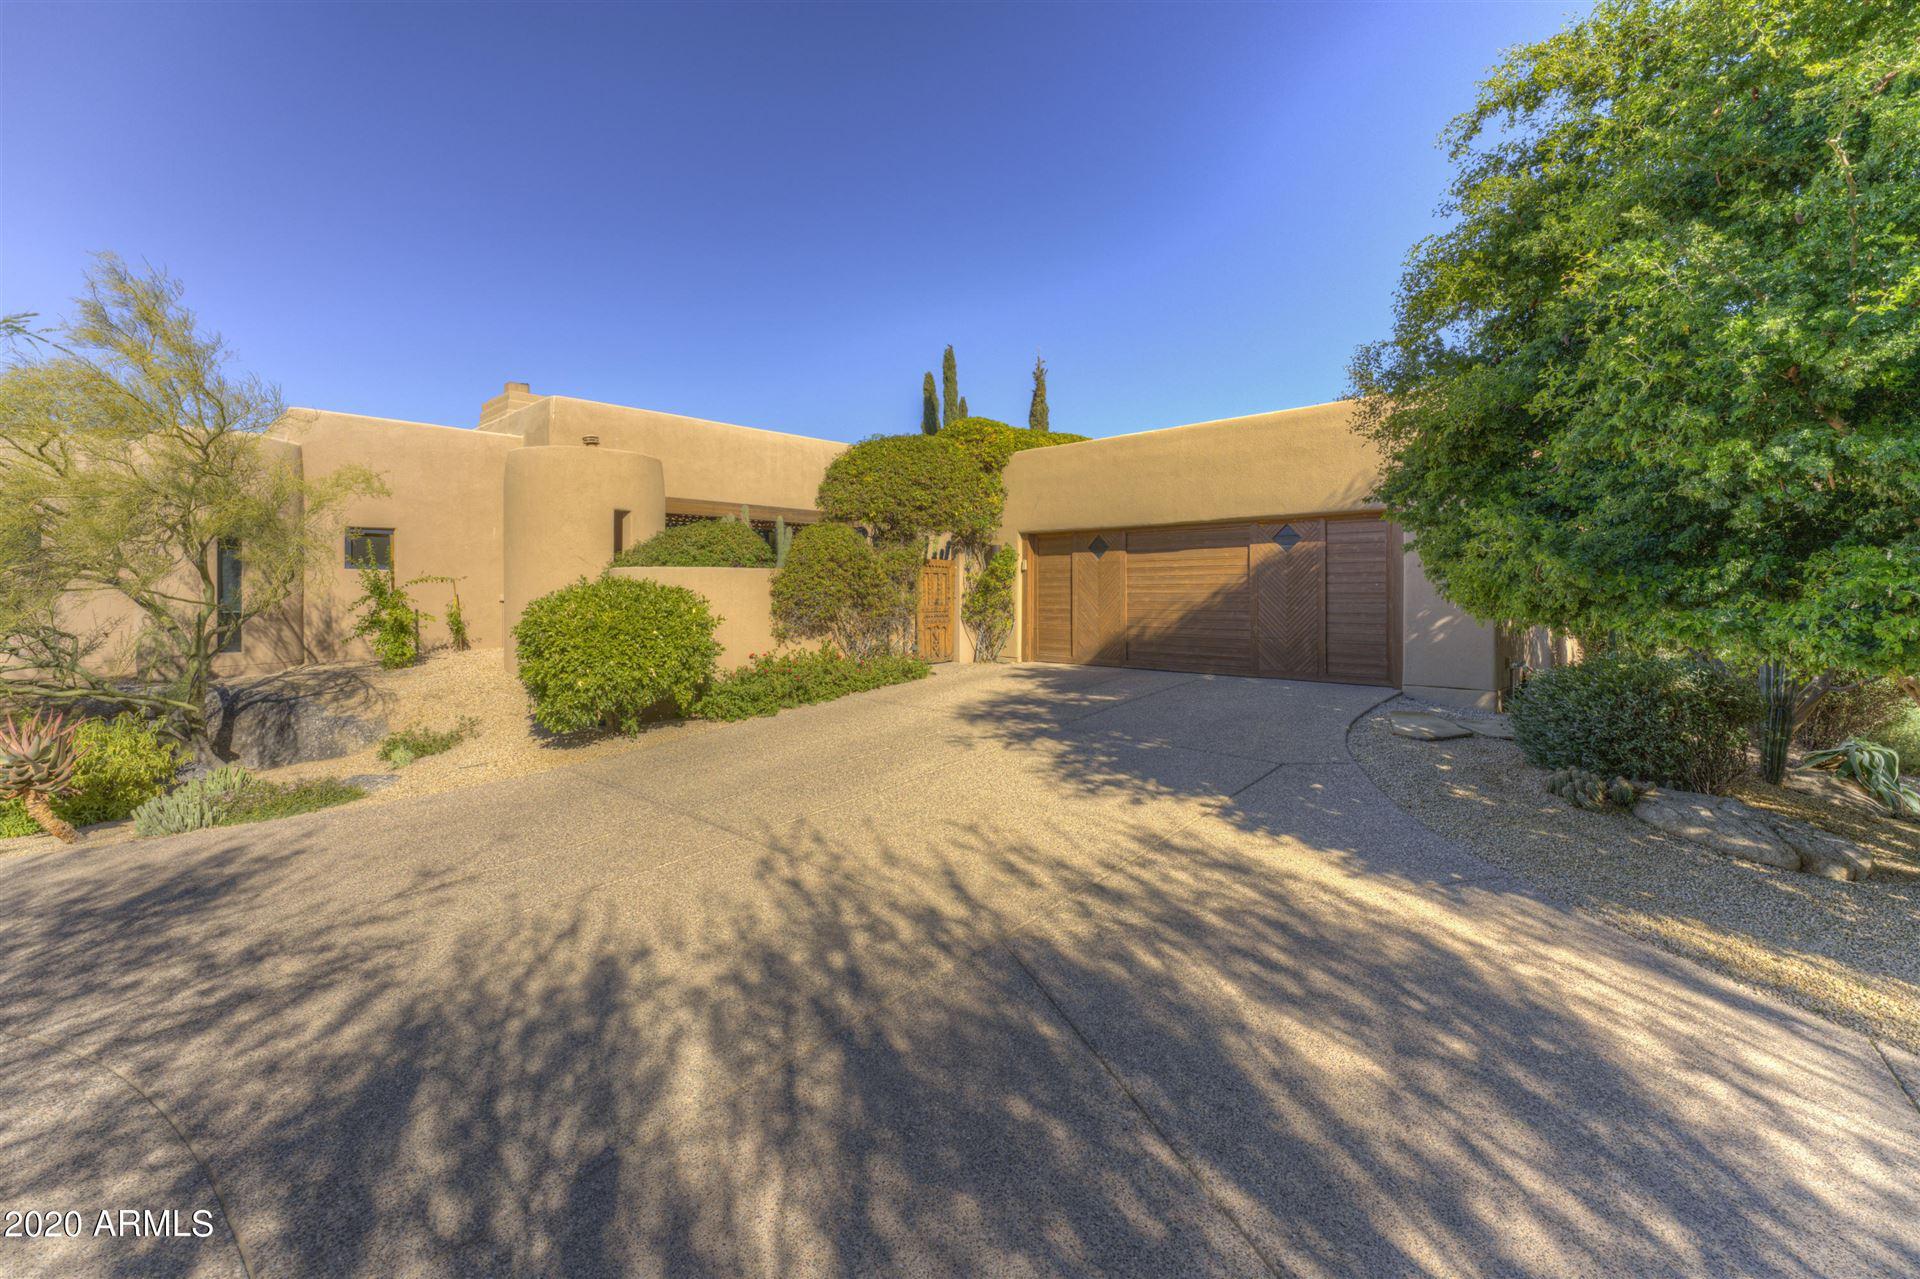 Photo of 3120 E ARROYO HONDO Road, Carefree, AZ 85377 (MLS # 6190432)